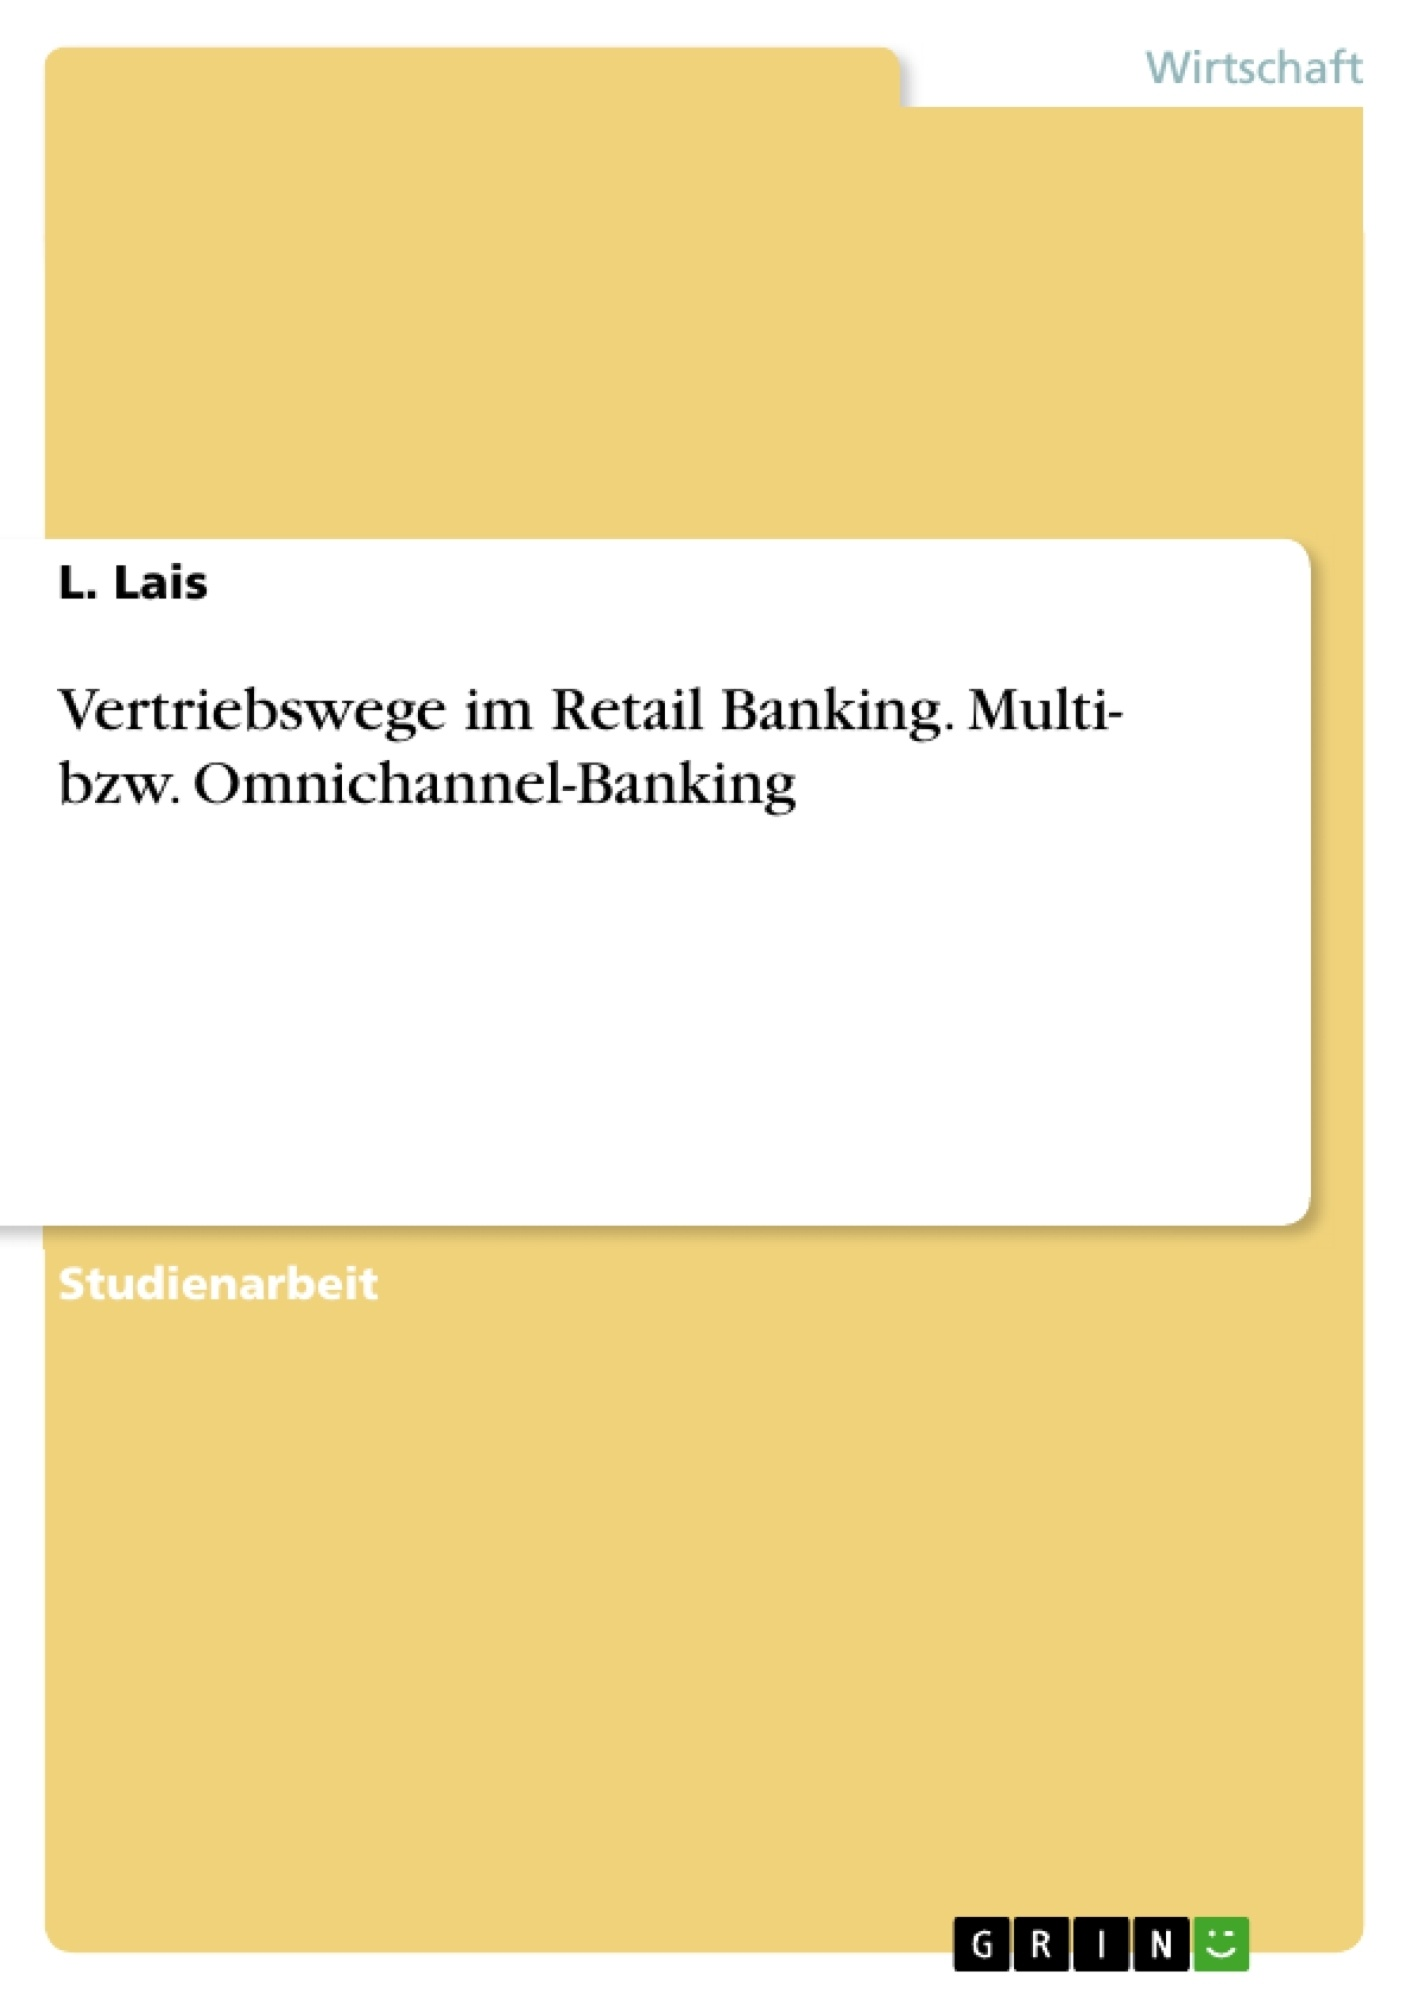 Titel: Vertriebswege im Retail Banking. Multi- bzw. Omnichannel-Banking